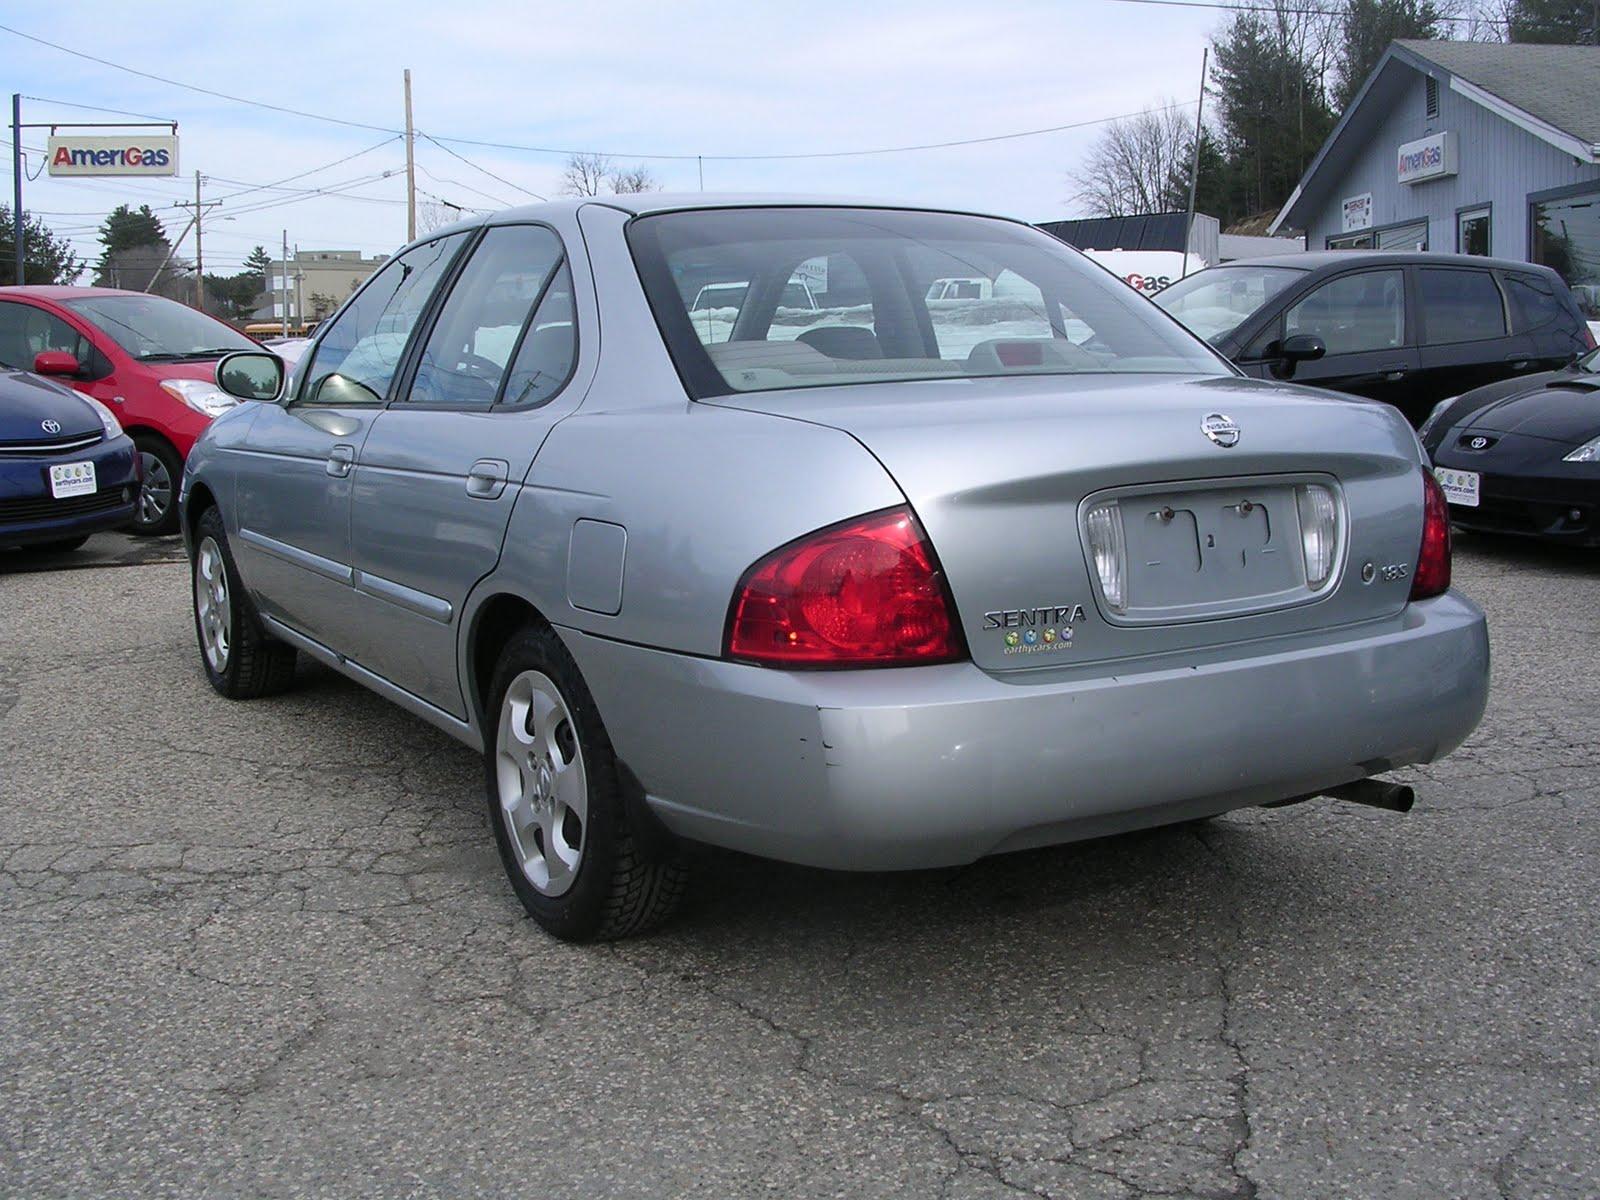 Earthy Cars Blog: EARTHY CAR OF THE WEEK: 2004 Nissan